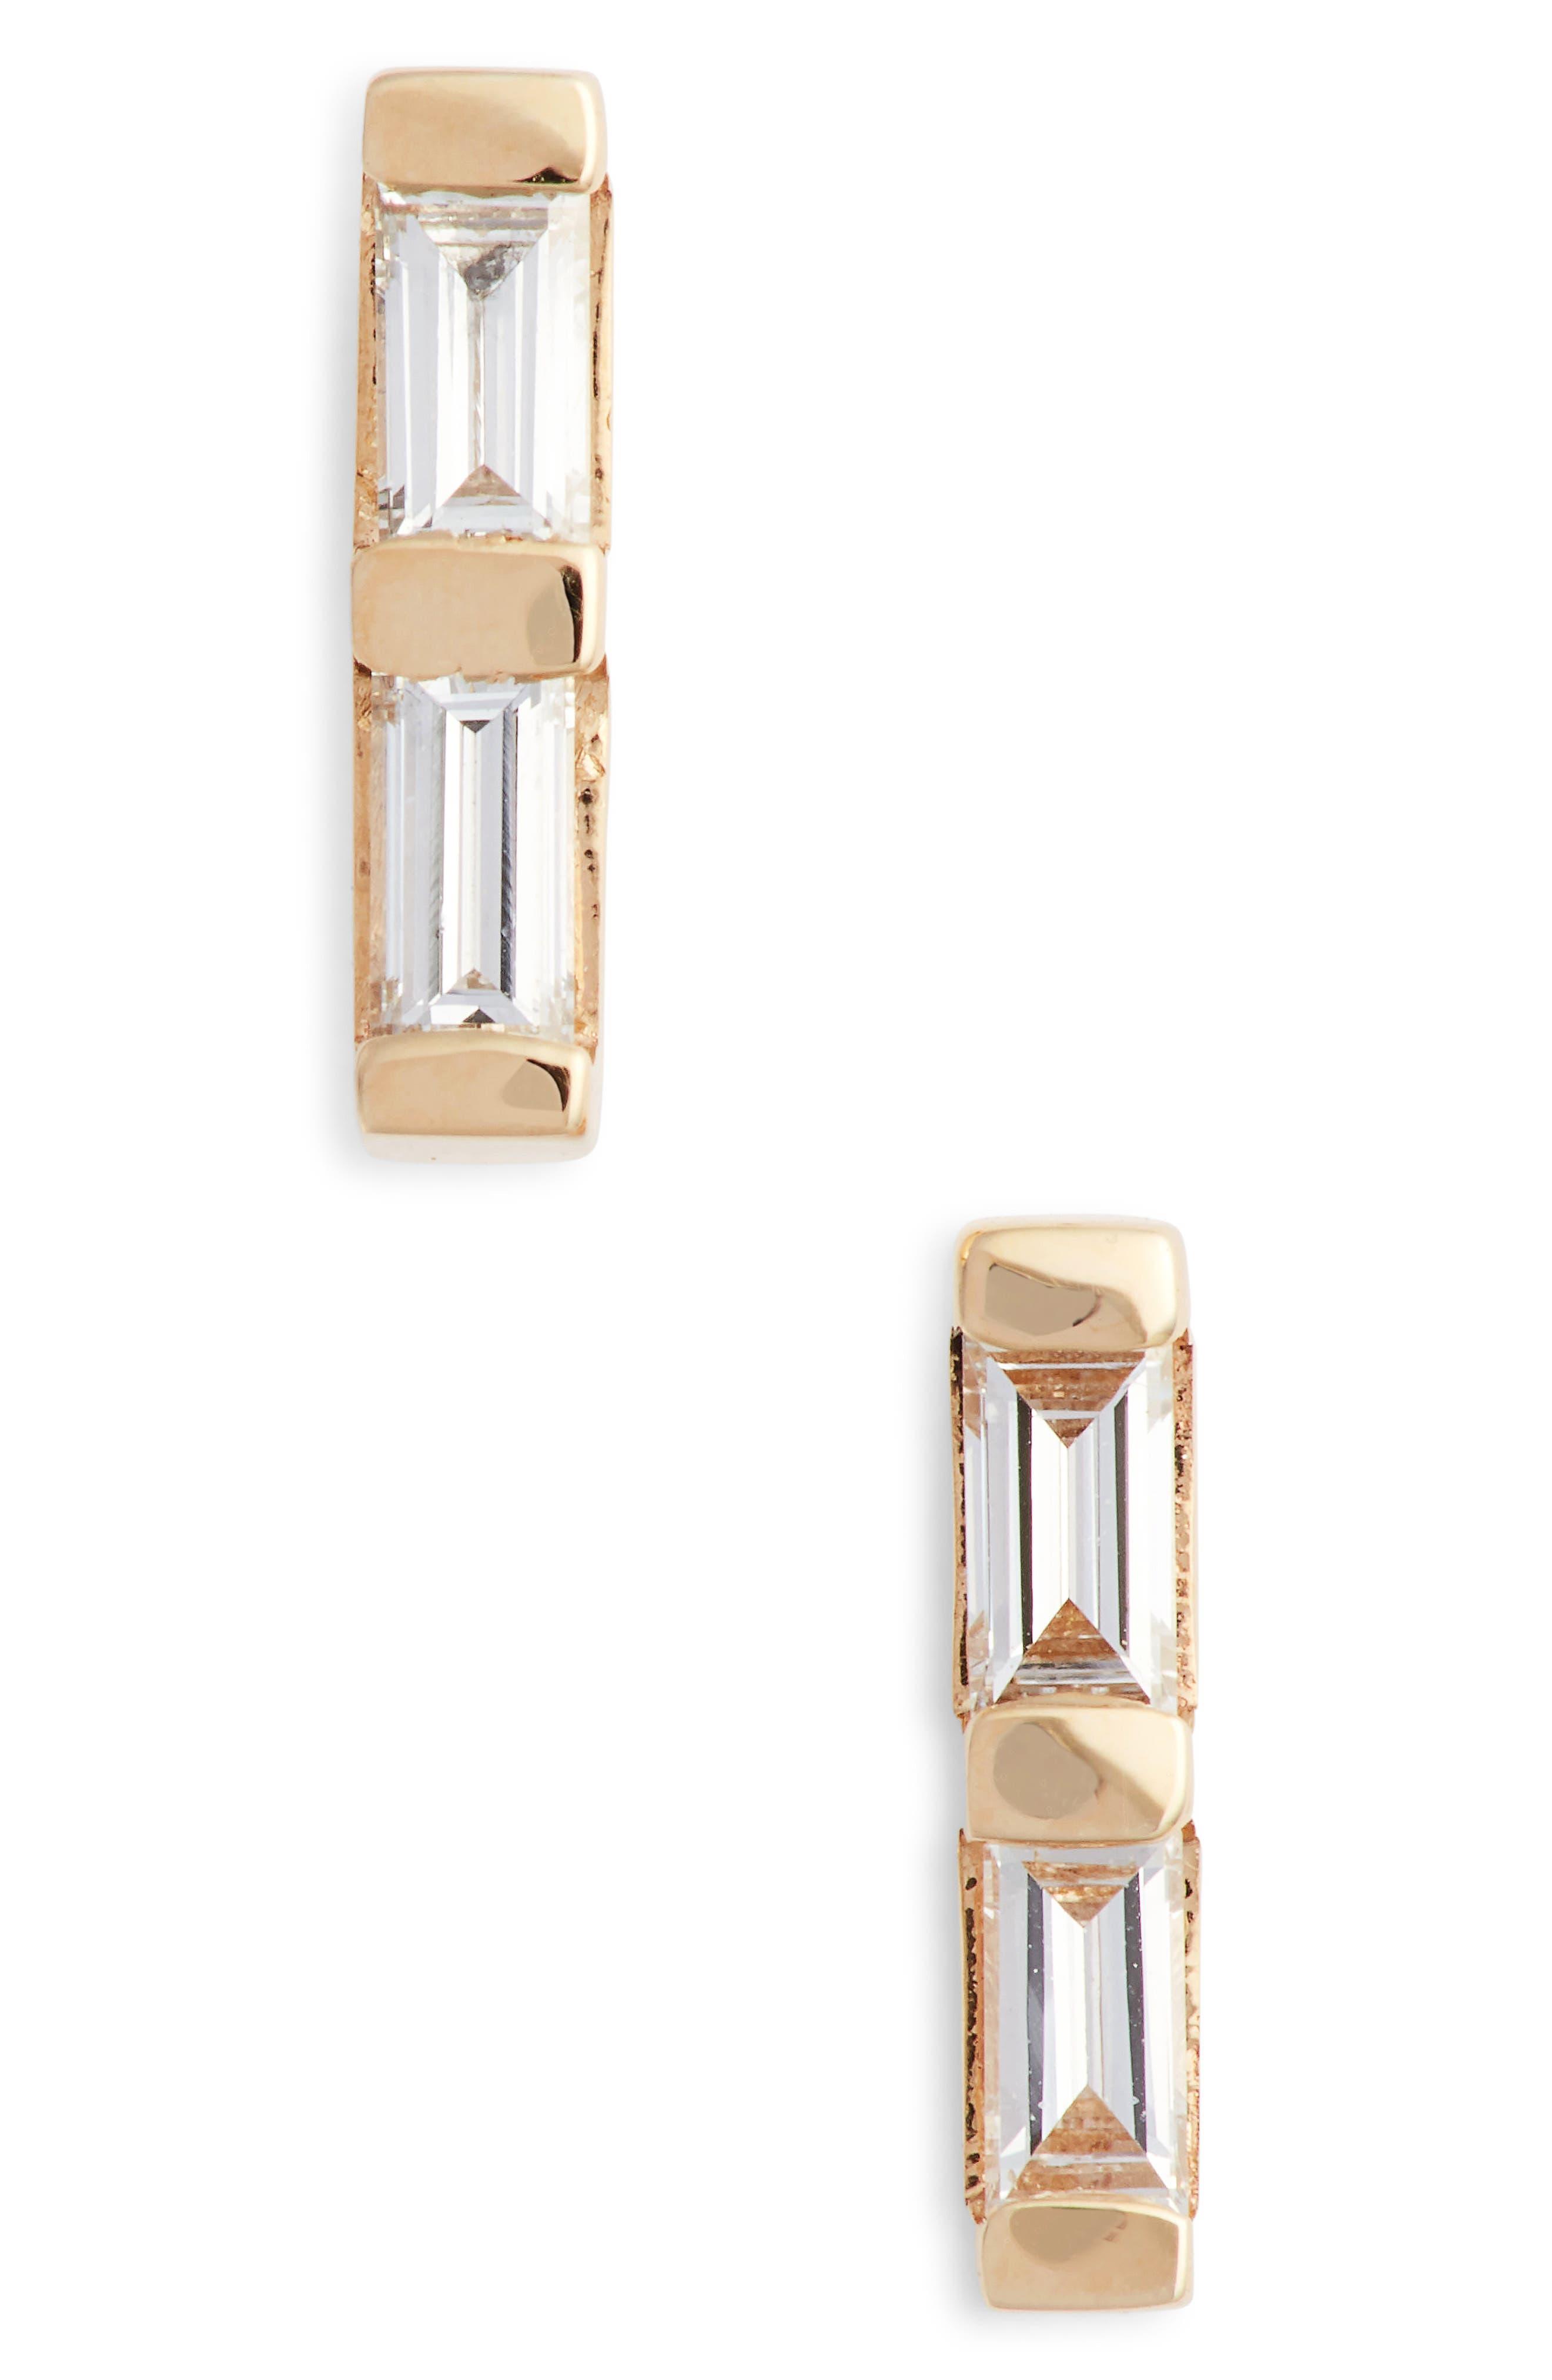 Dana Rebecca Sadie Diamond Stud Earrings,                             Main thumbnail 1, color,                             YELLOW GOLD